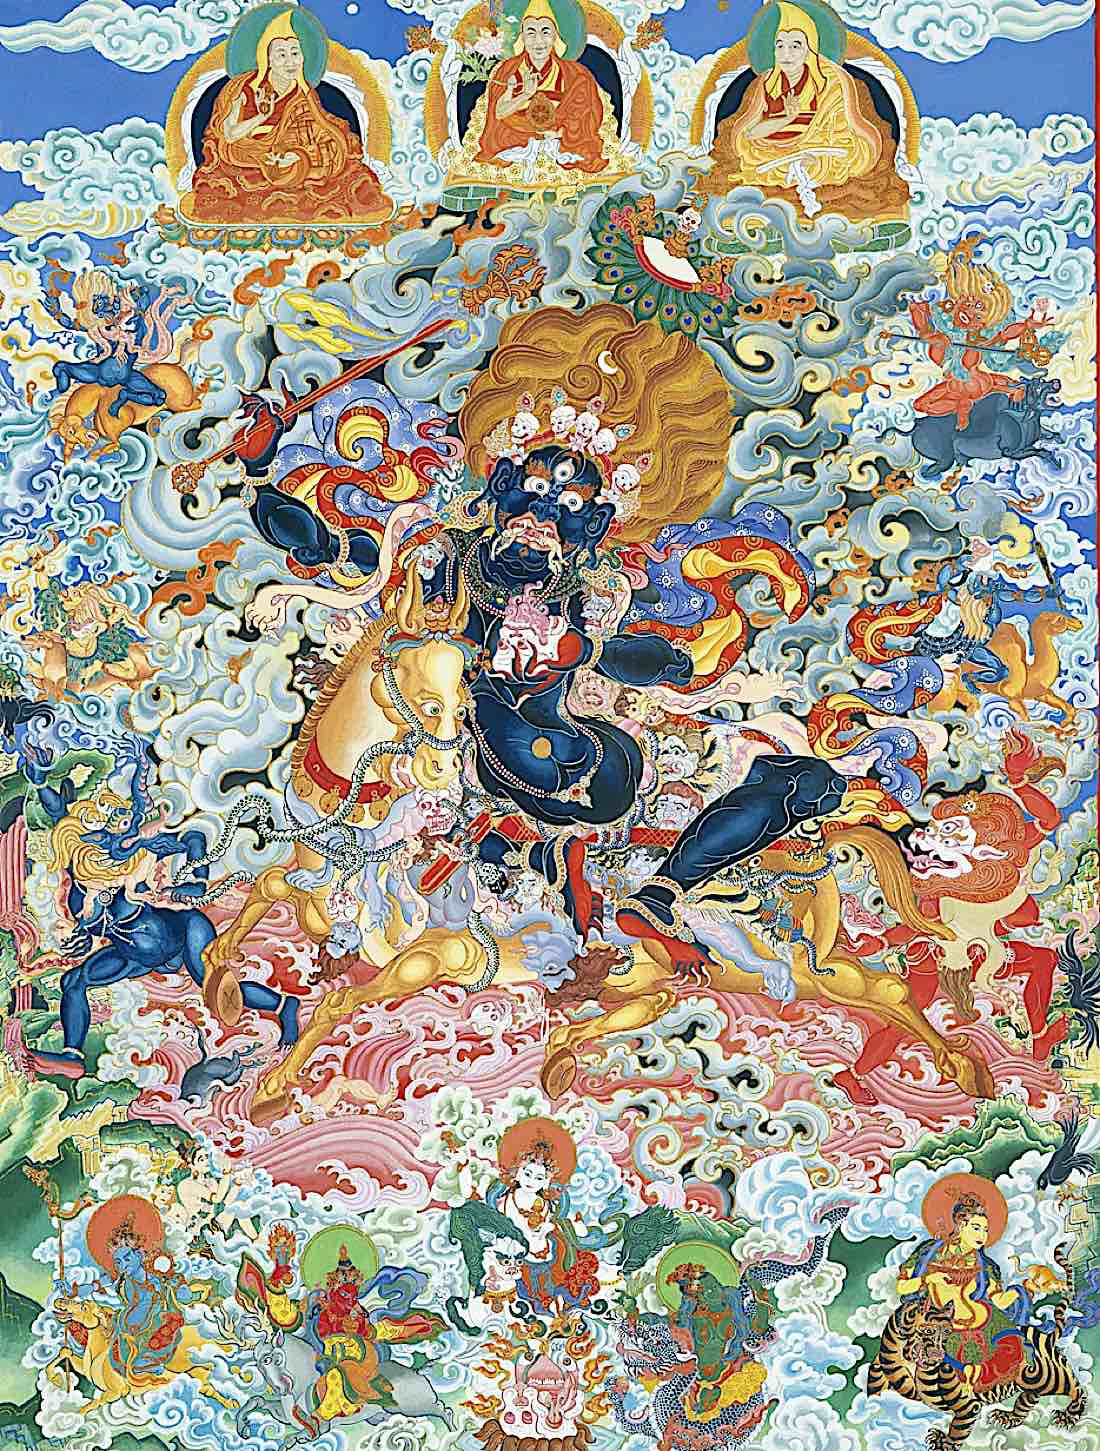 Buddha Weekly Palden Lhamo art by Kayla Kimoto available on Etsy as prints Buddhism